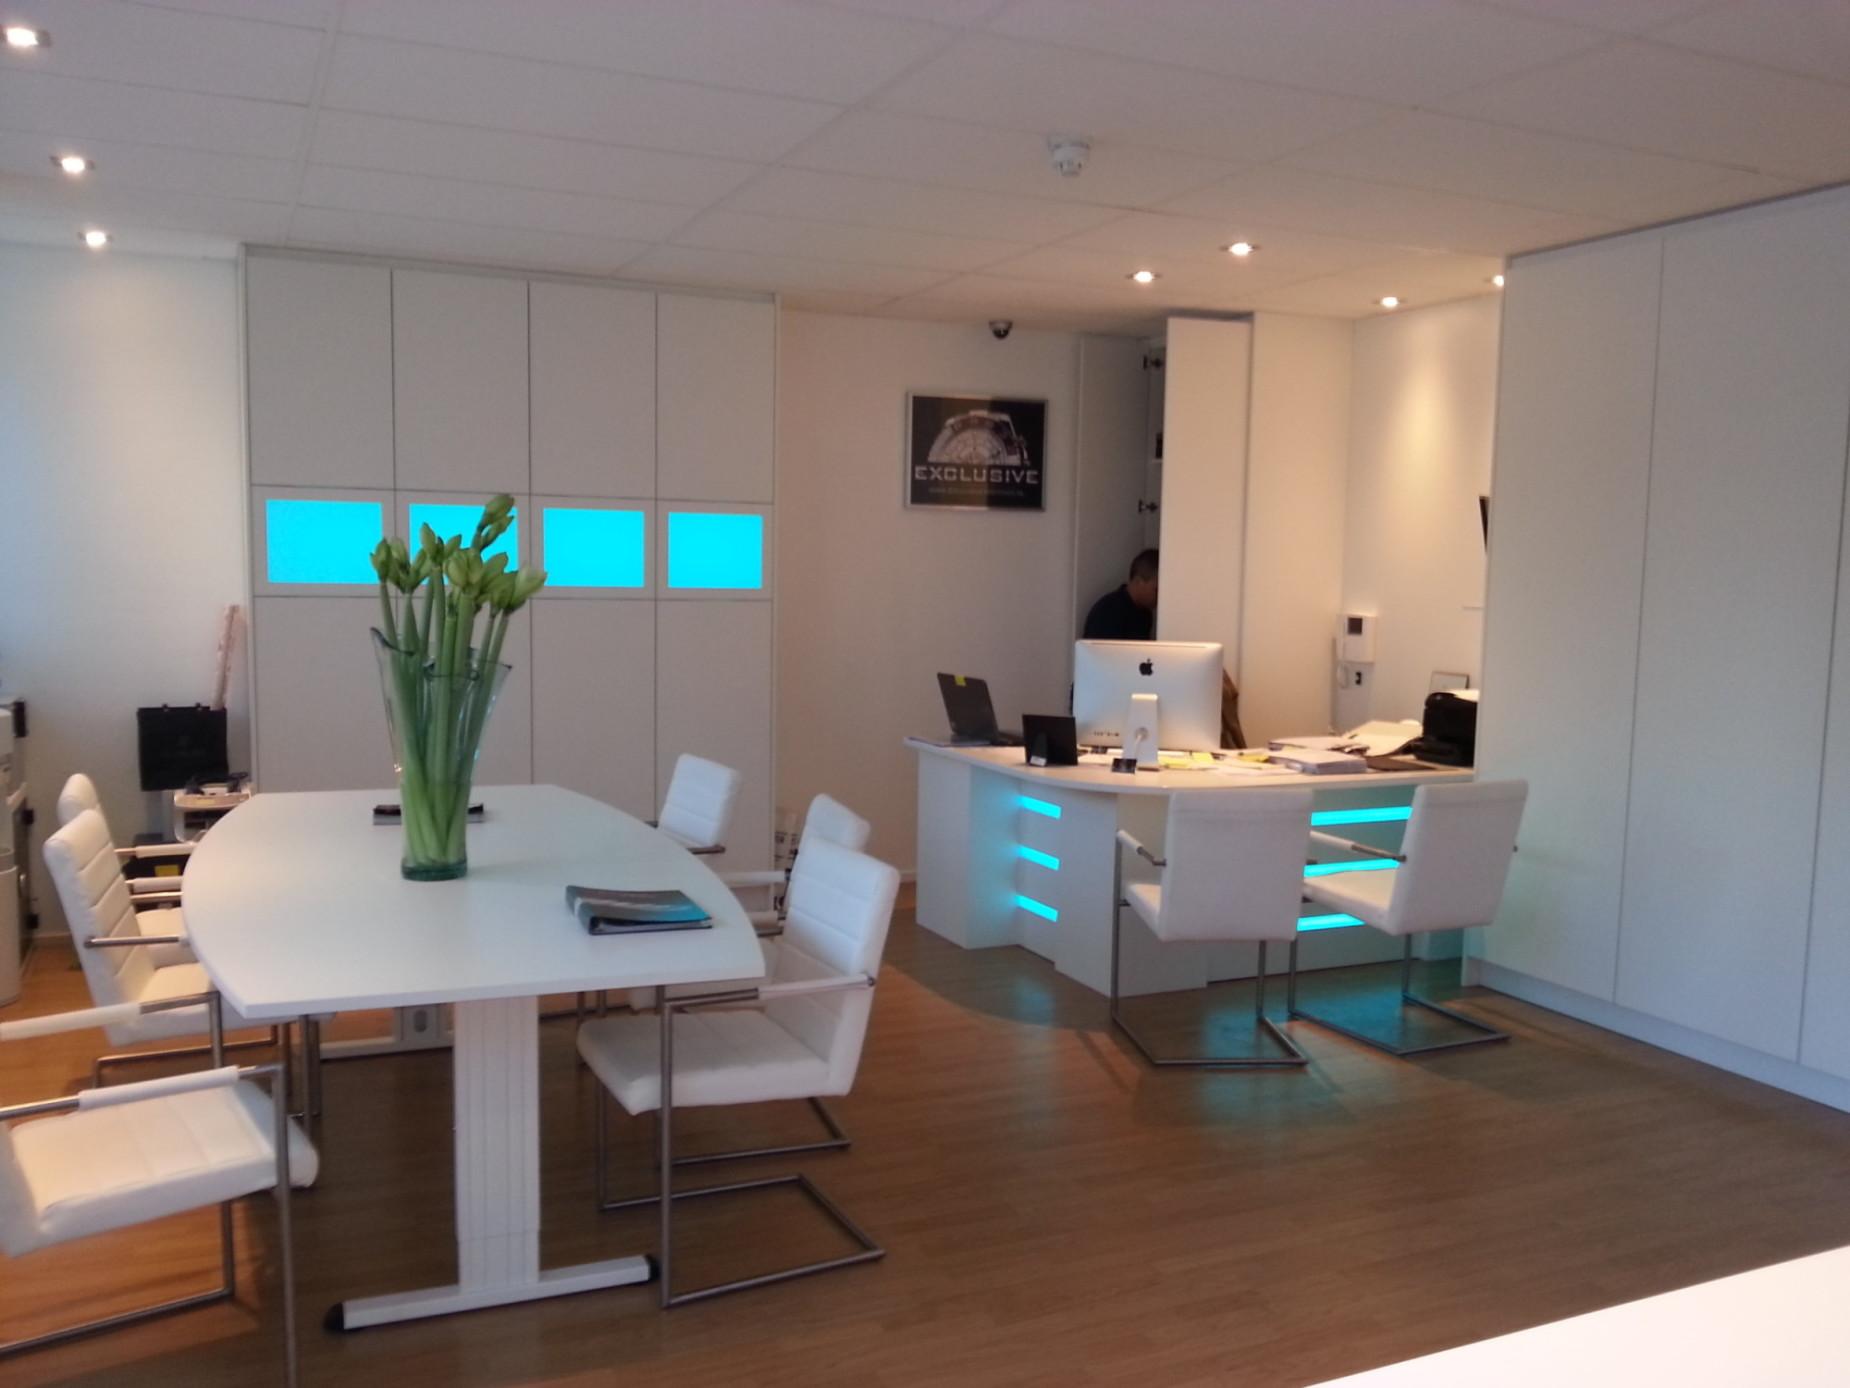 kantoor inrichting rimo interieurdesign